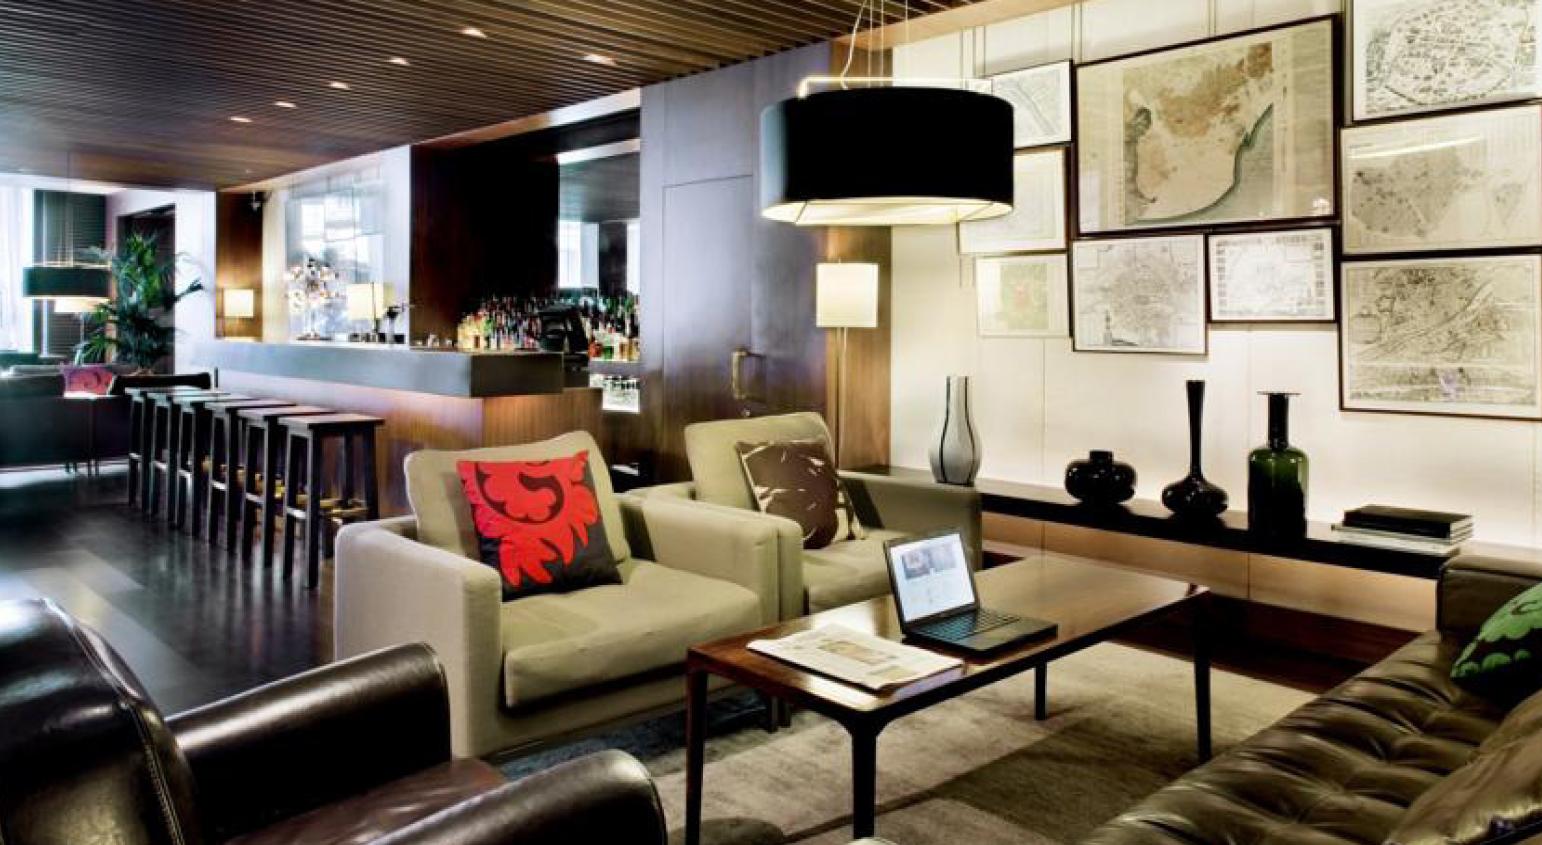 GeorgKayser_architecture_interiordesign_comercial_hotelregina_4.jpg